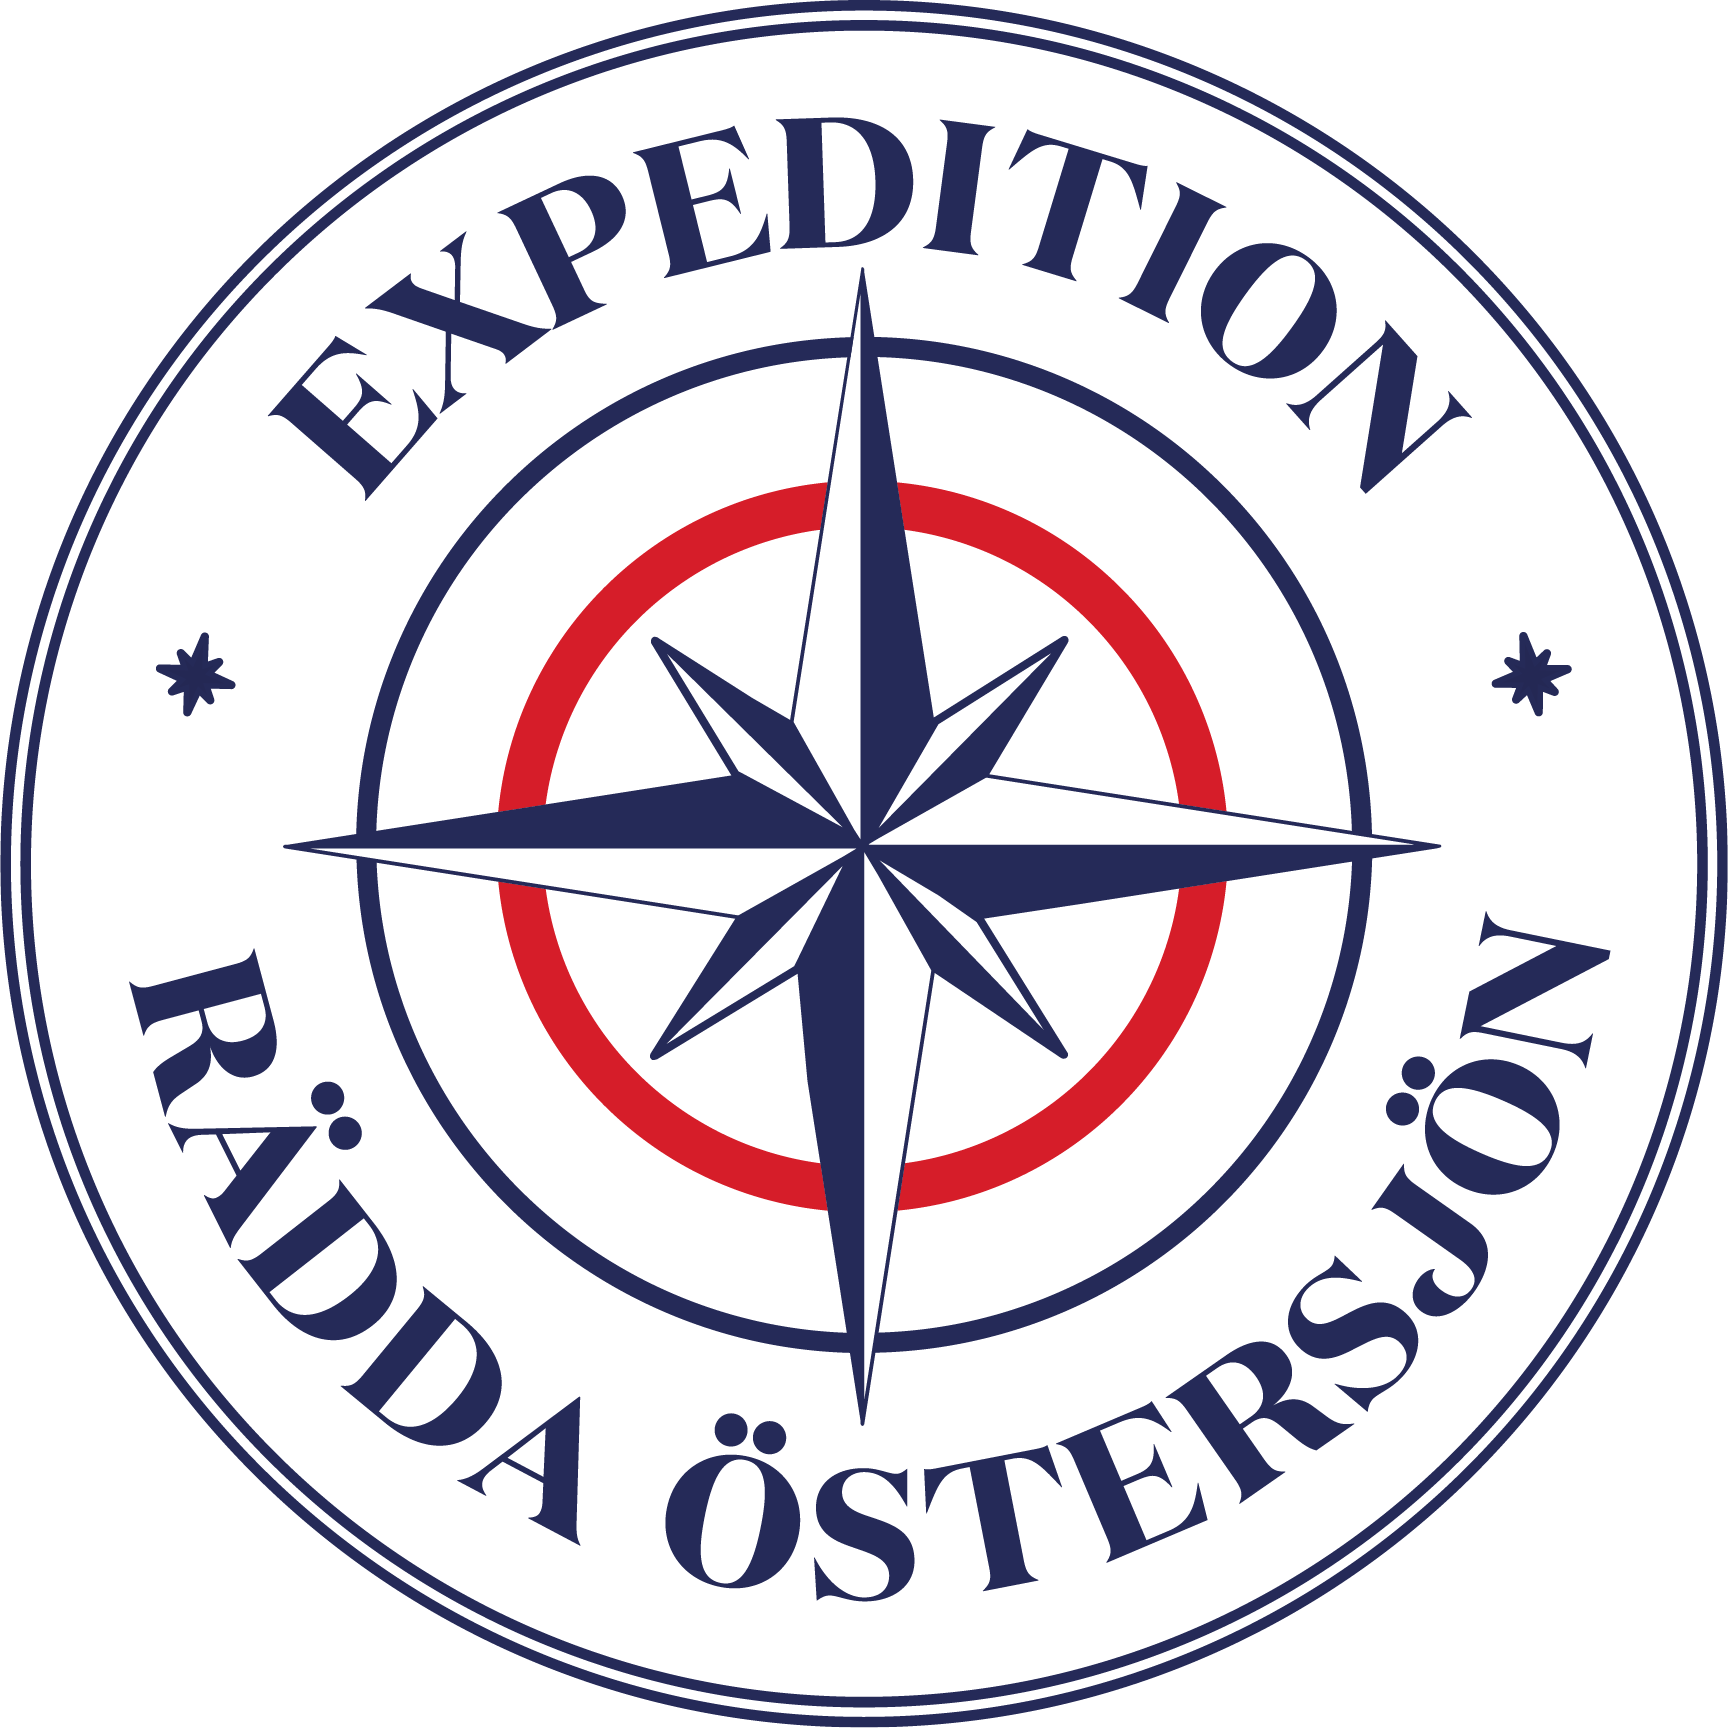 Expedition Rädda Östersjön Logotyp